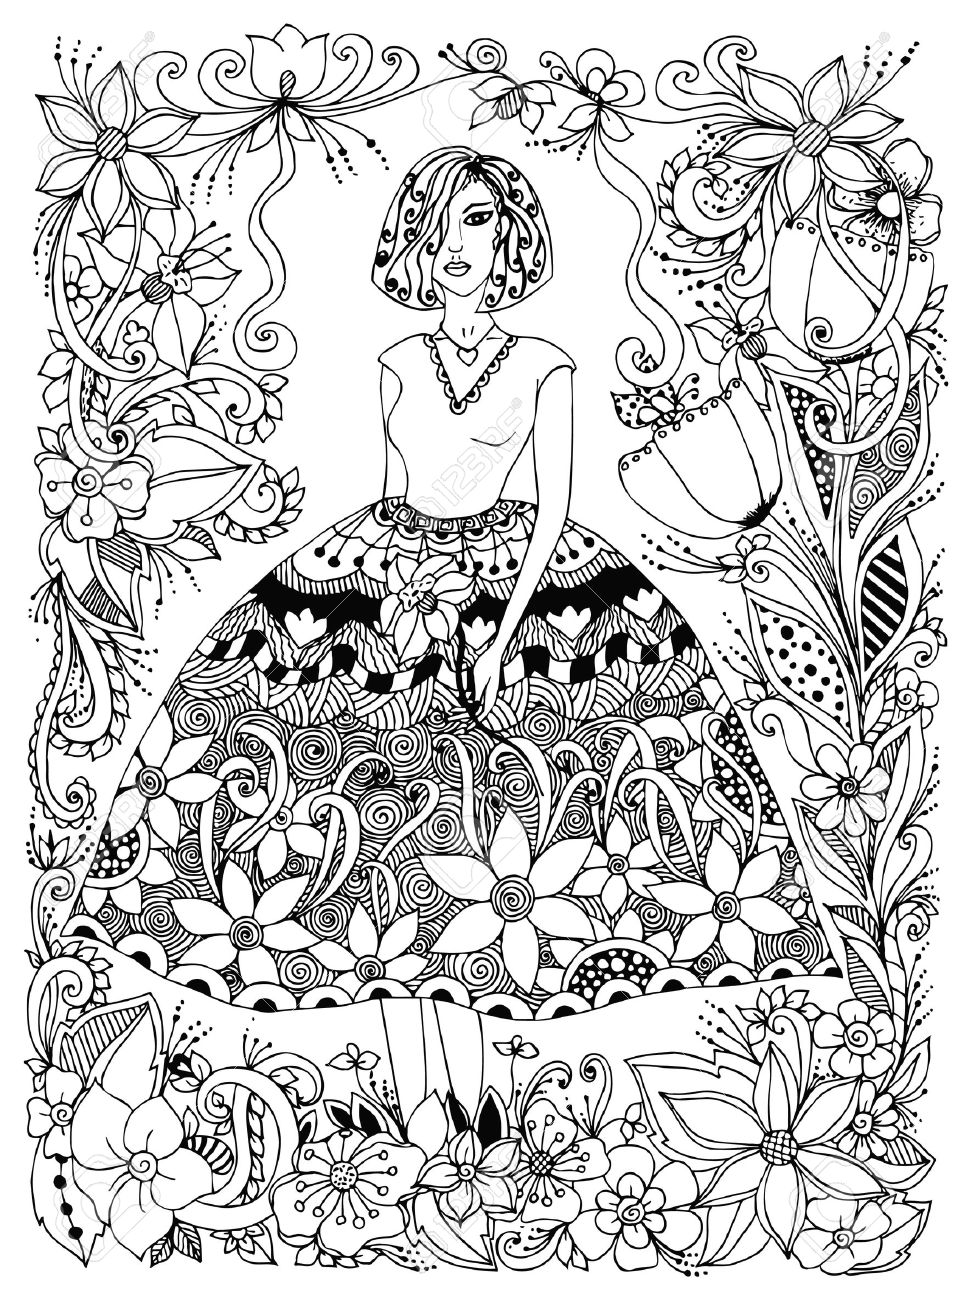 Vector illustration girl holding flower in lush dress full growth. Frame of flowers, doodle, zenart. Black and white. Anti-stress. Adult coloring books. - 56031760